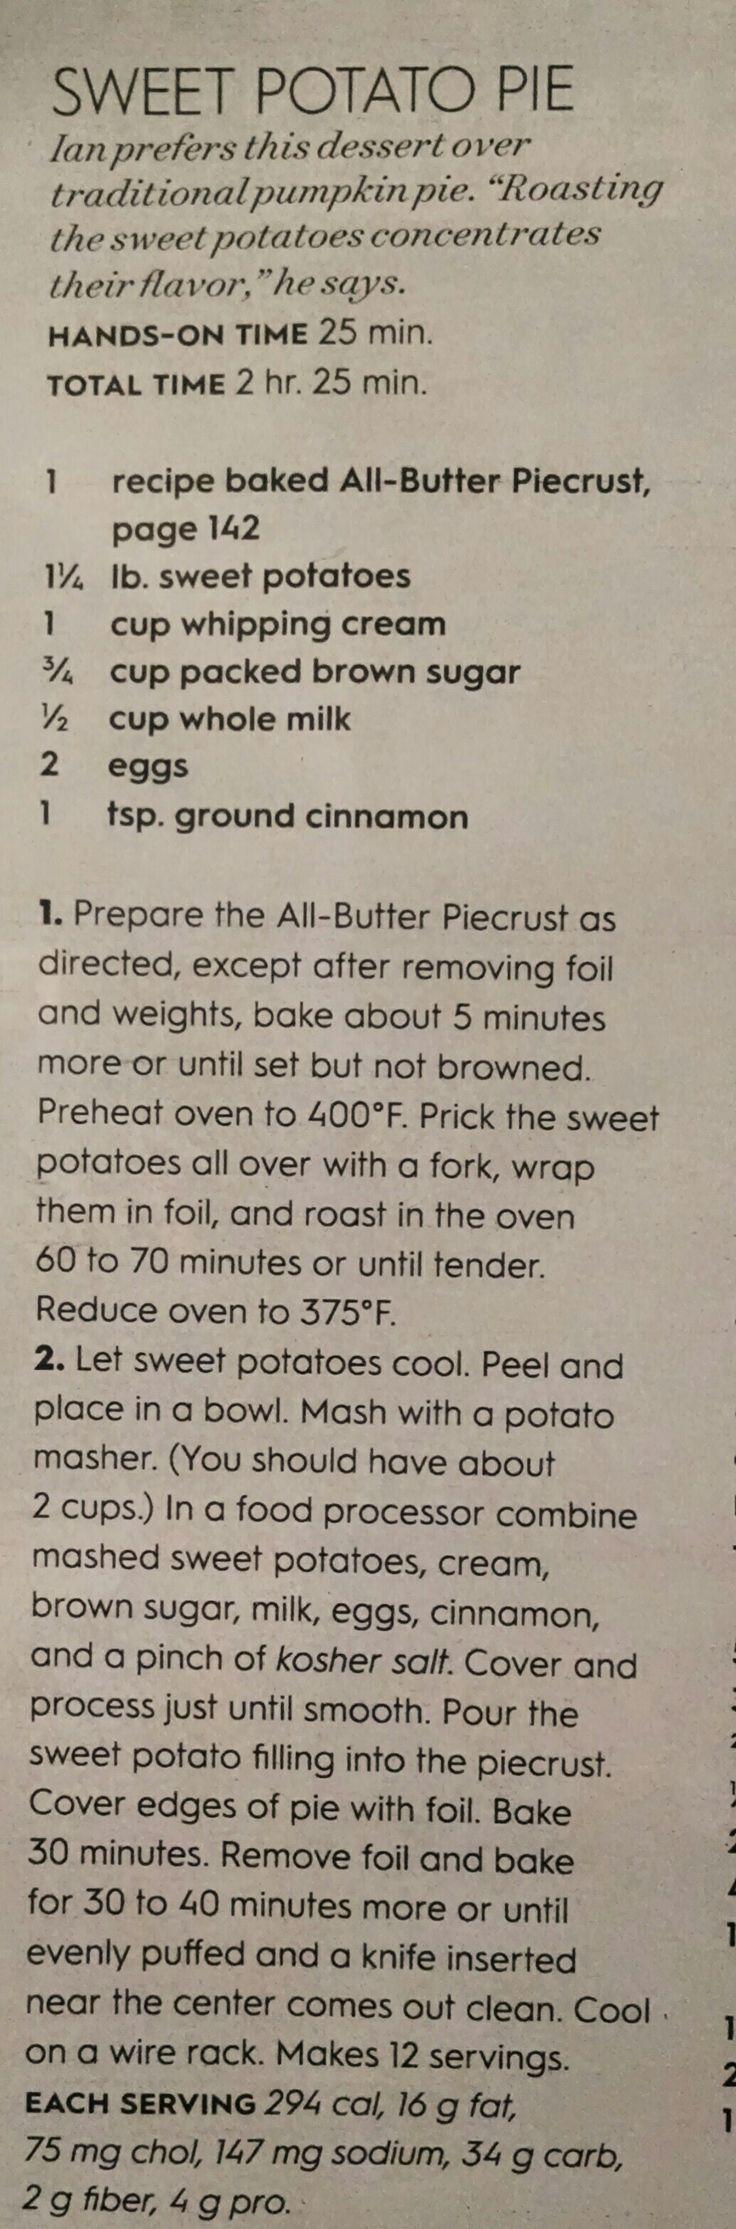 Sweet Potato Pie, BHG